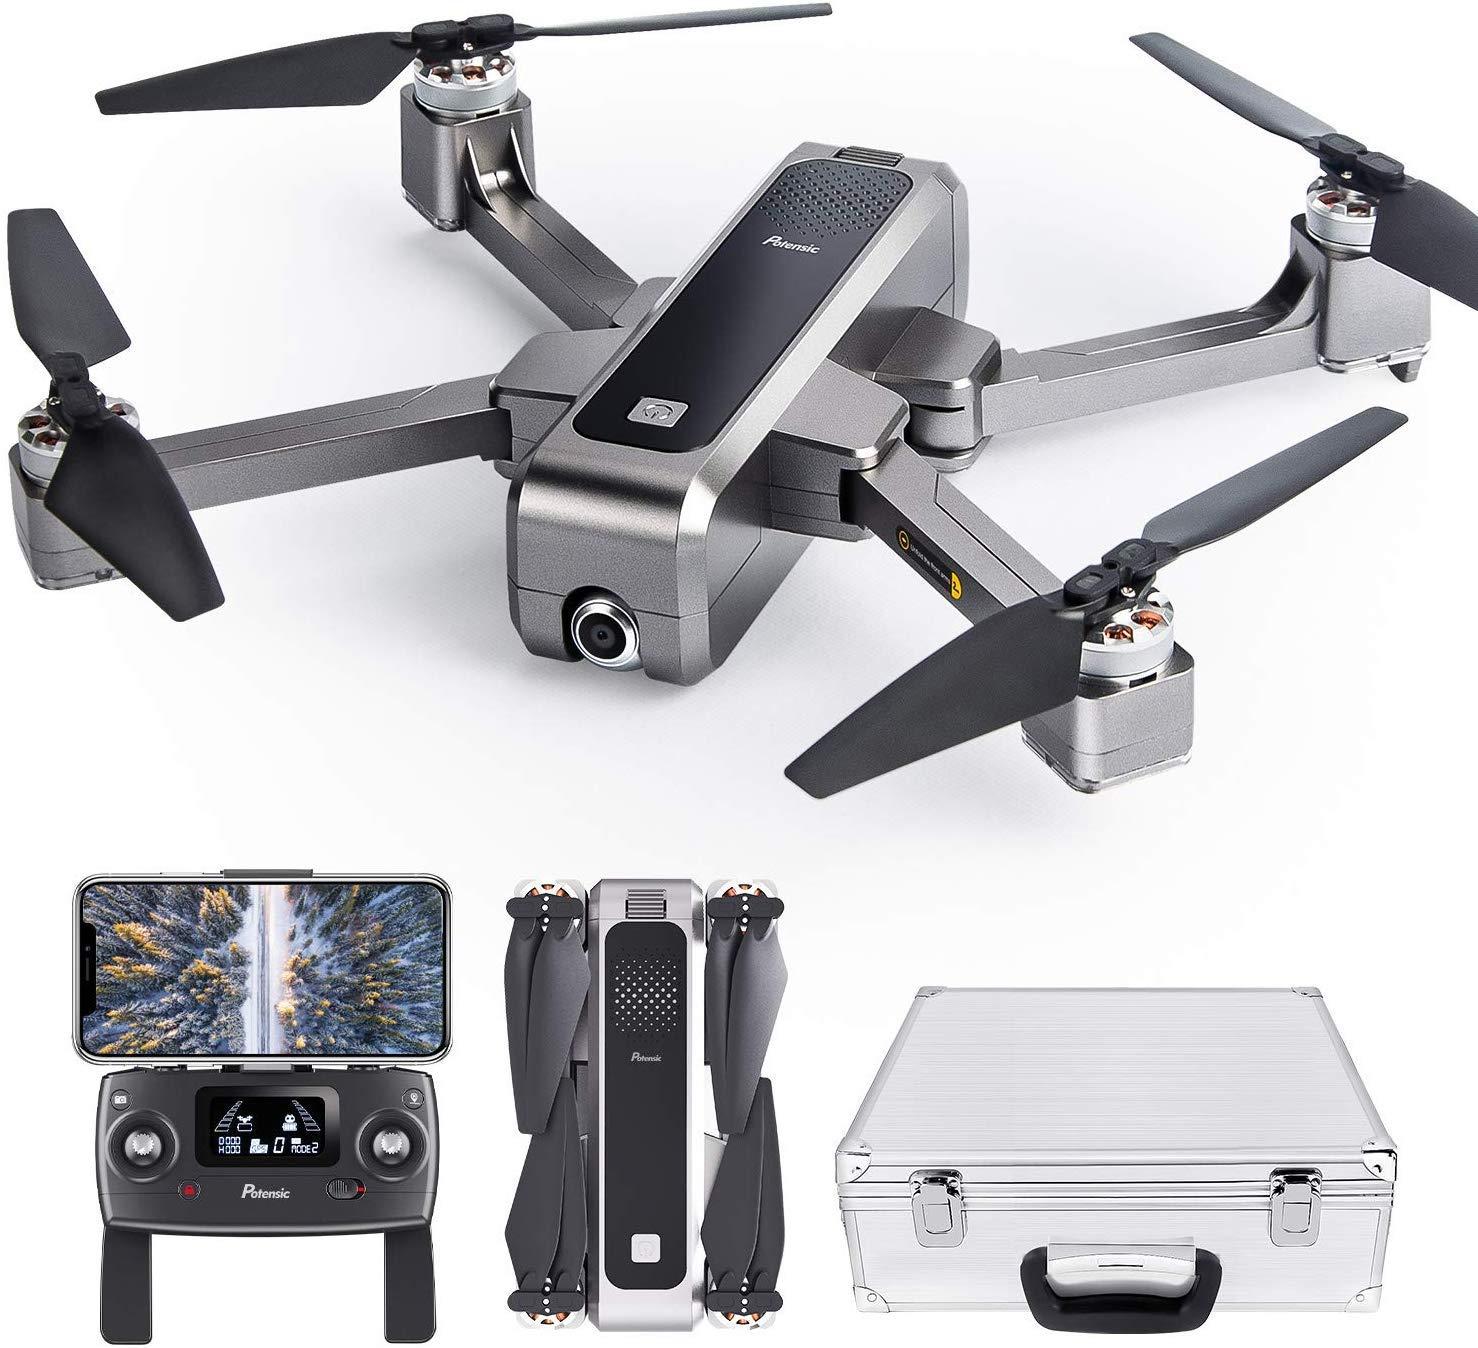 Potensic Quadcopter Ultrasonic Positioning Brushless